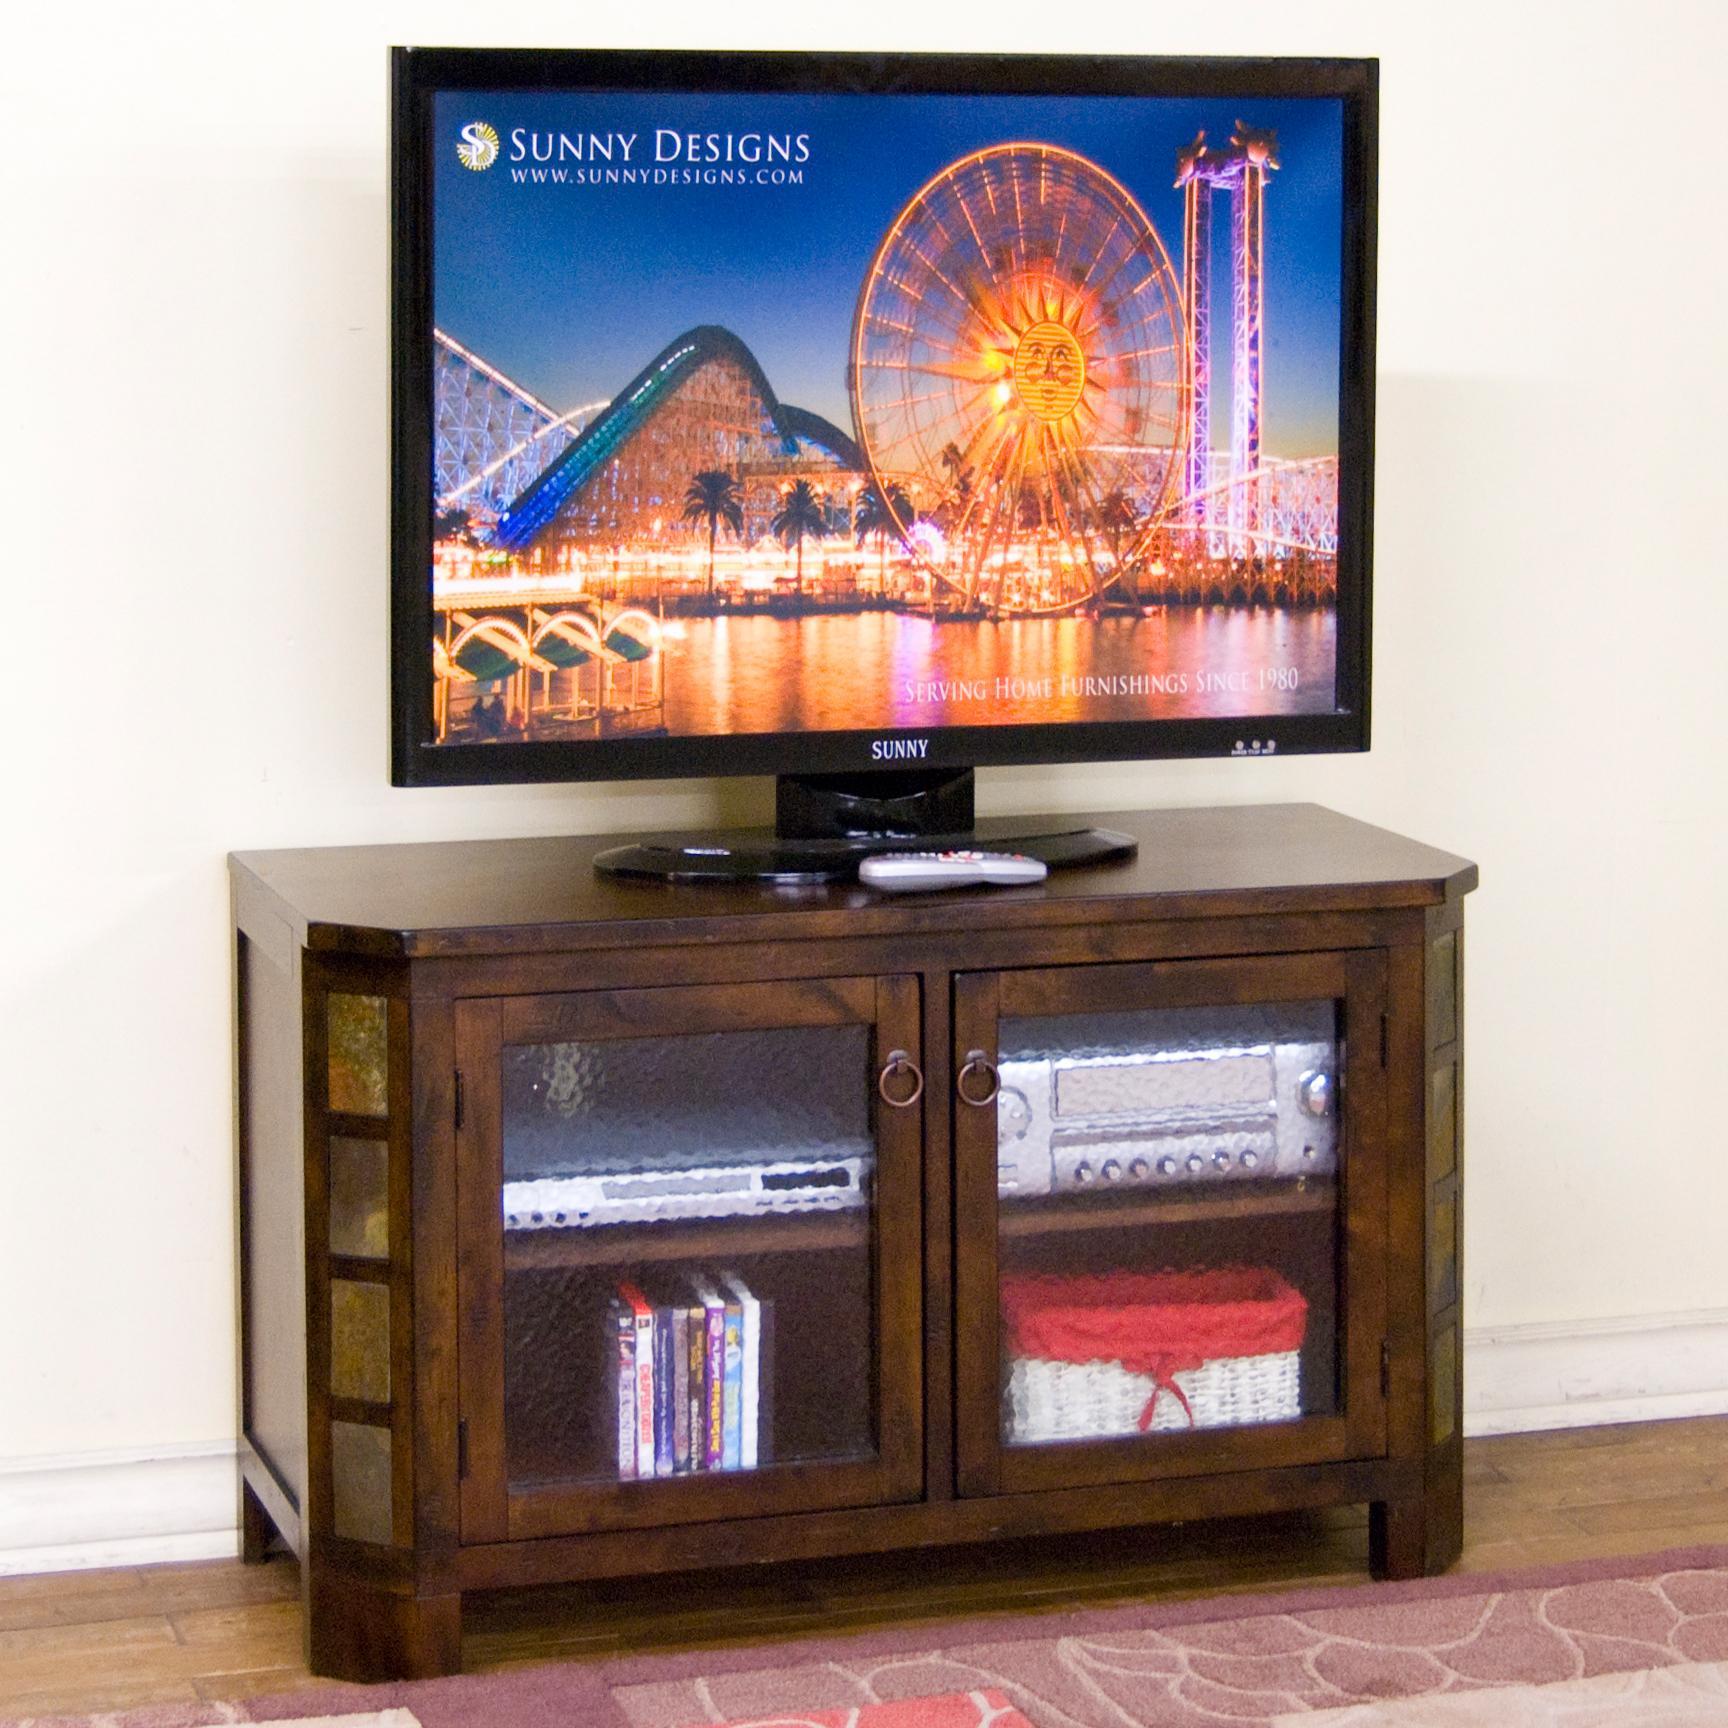 "Sunny Designs Santa Fe 45"" TV Console - Item Number: 3416DC-45"